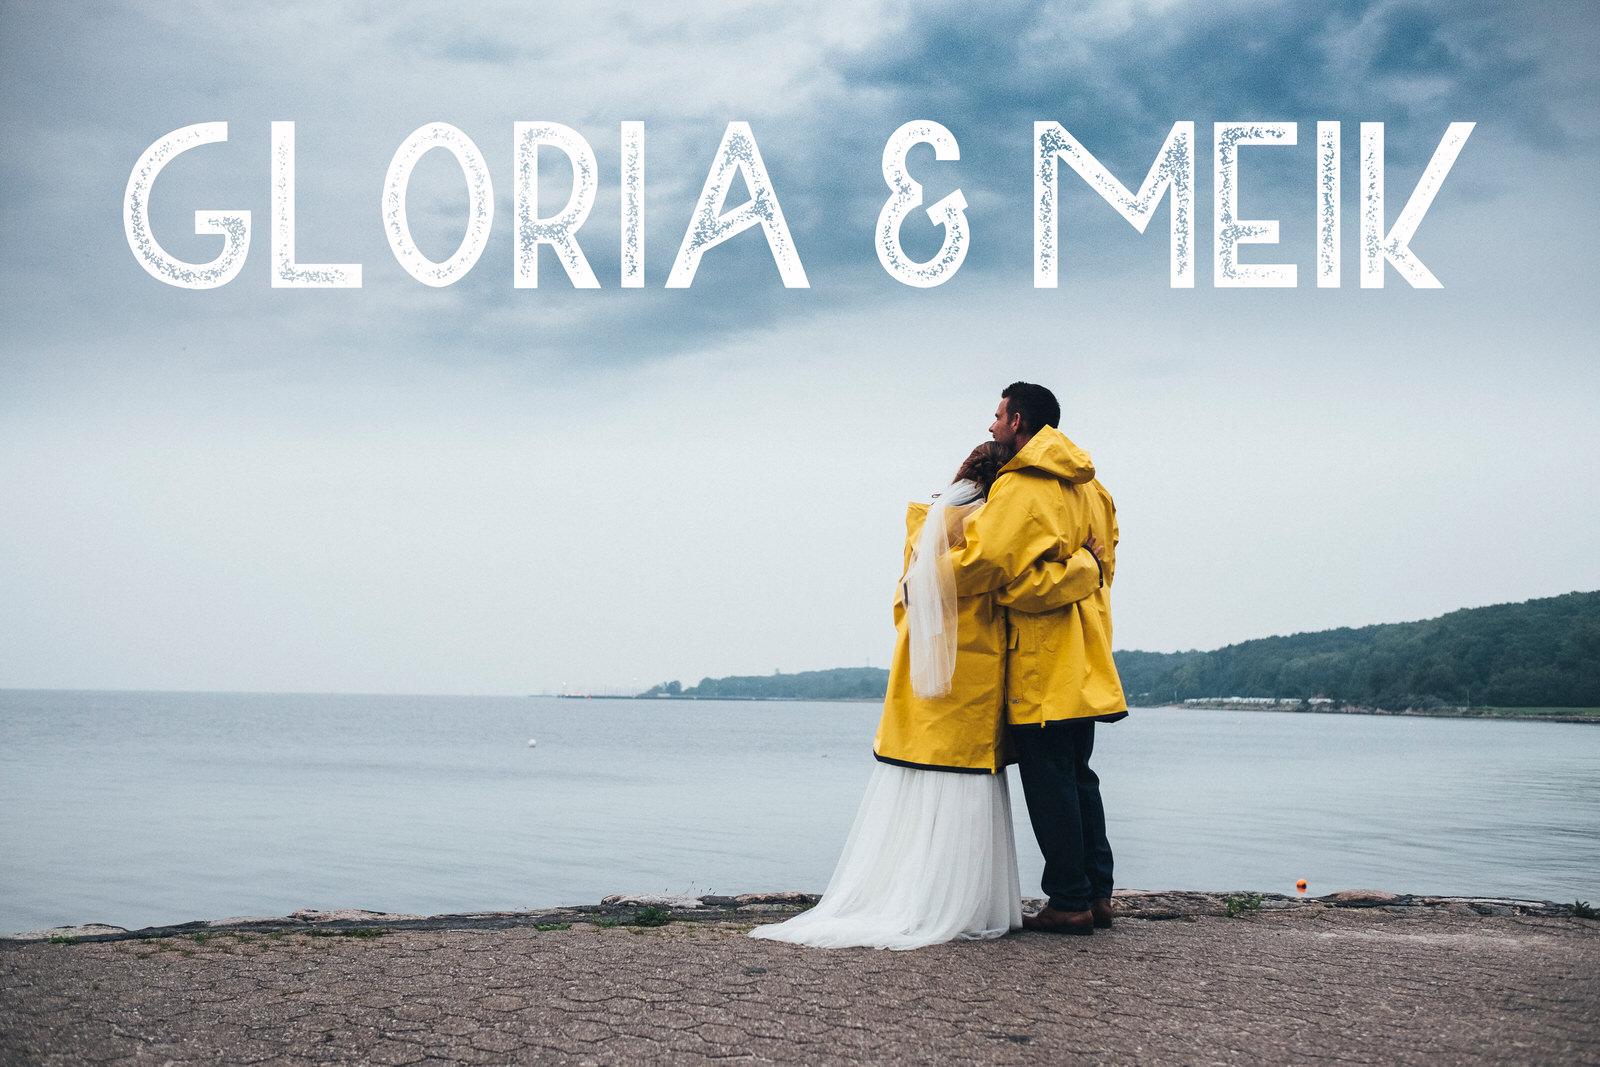 Click image to view this rainy wedding!